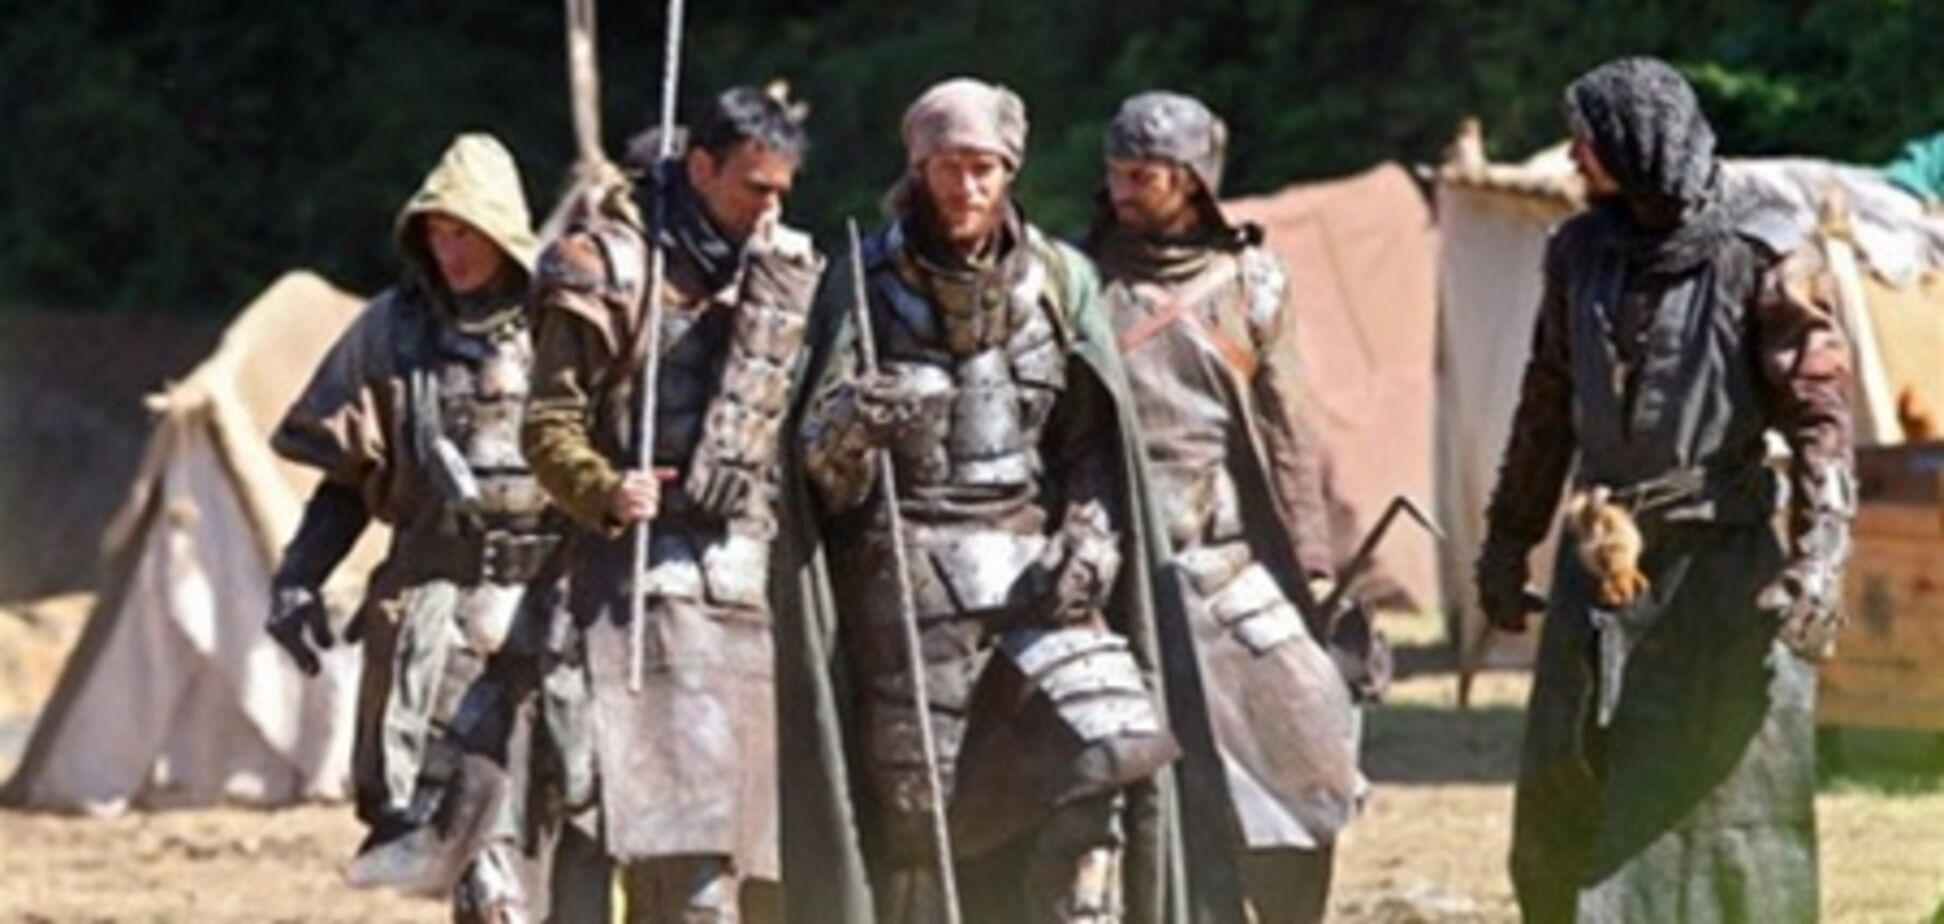 'Ной' Аронофски: актеры приехали на съемочную площадку